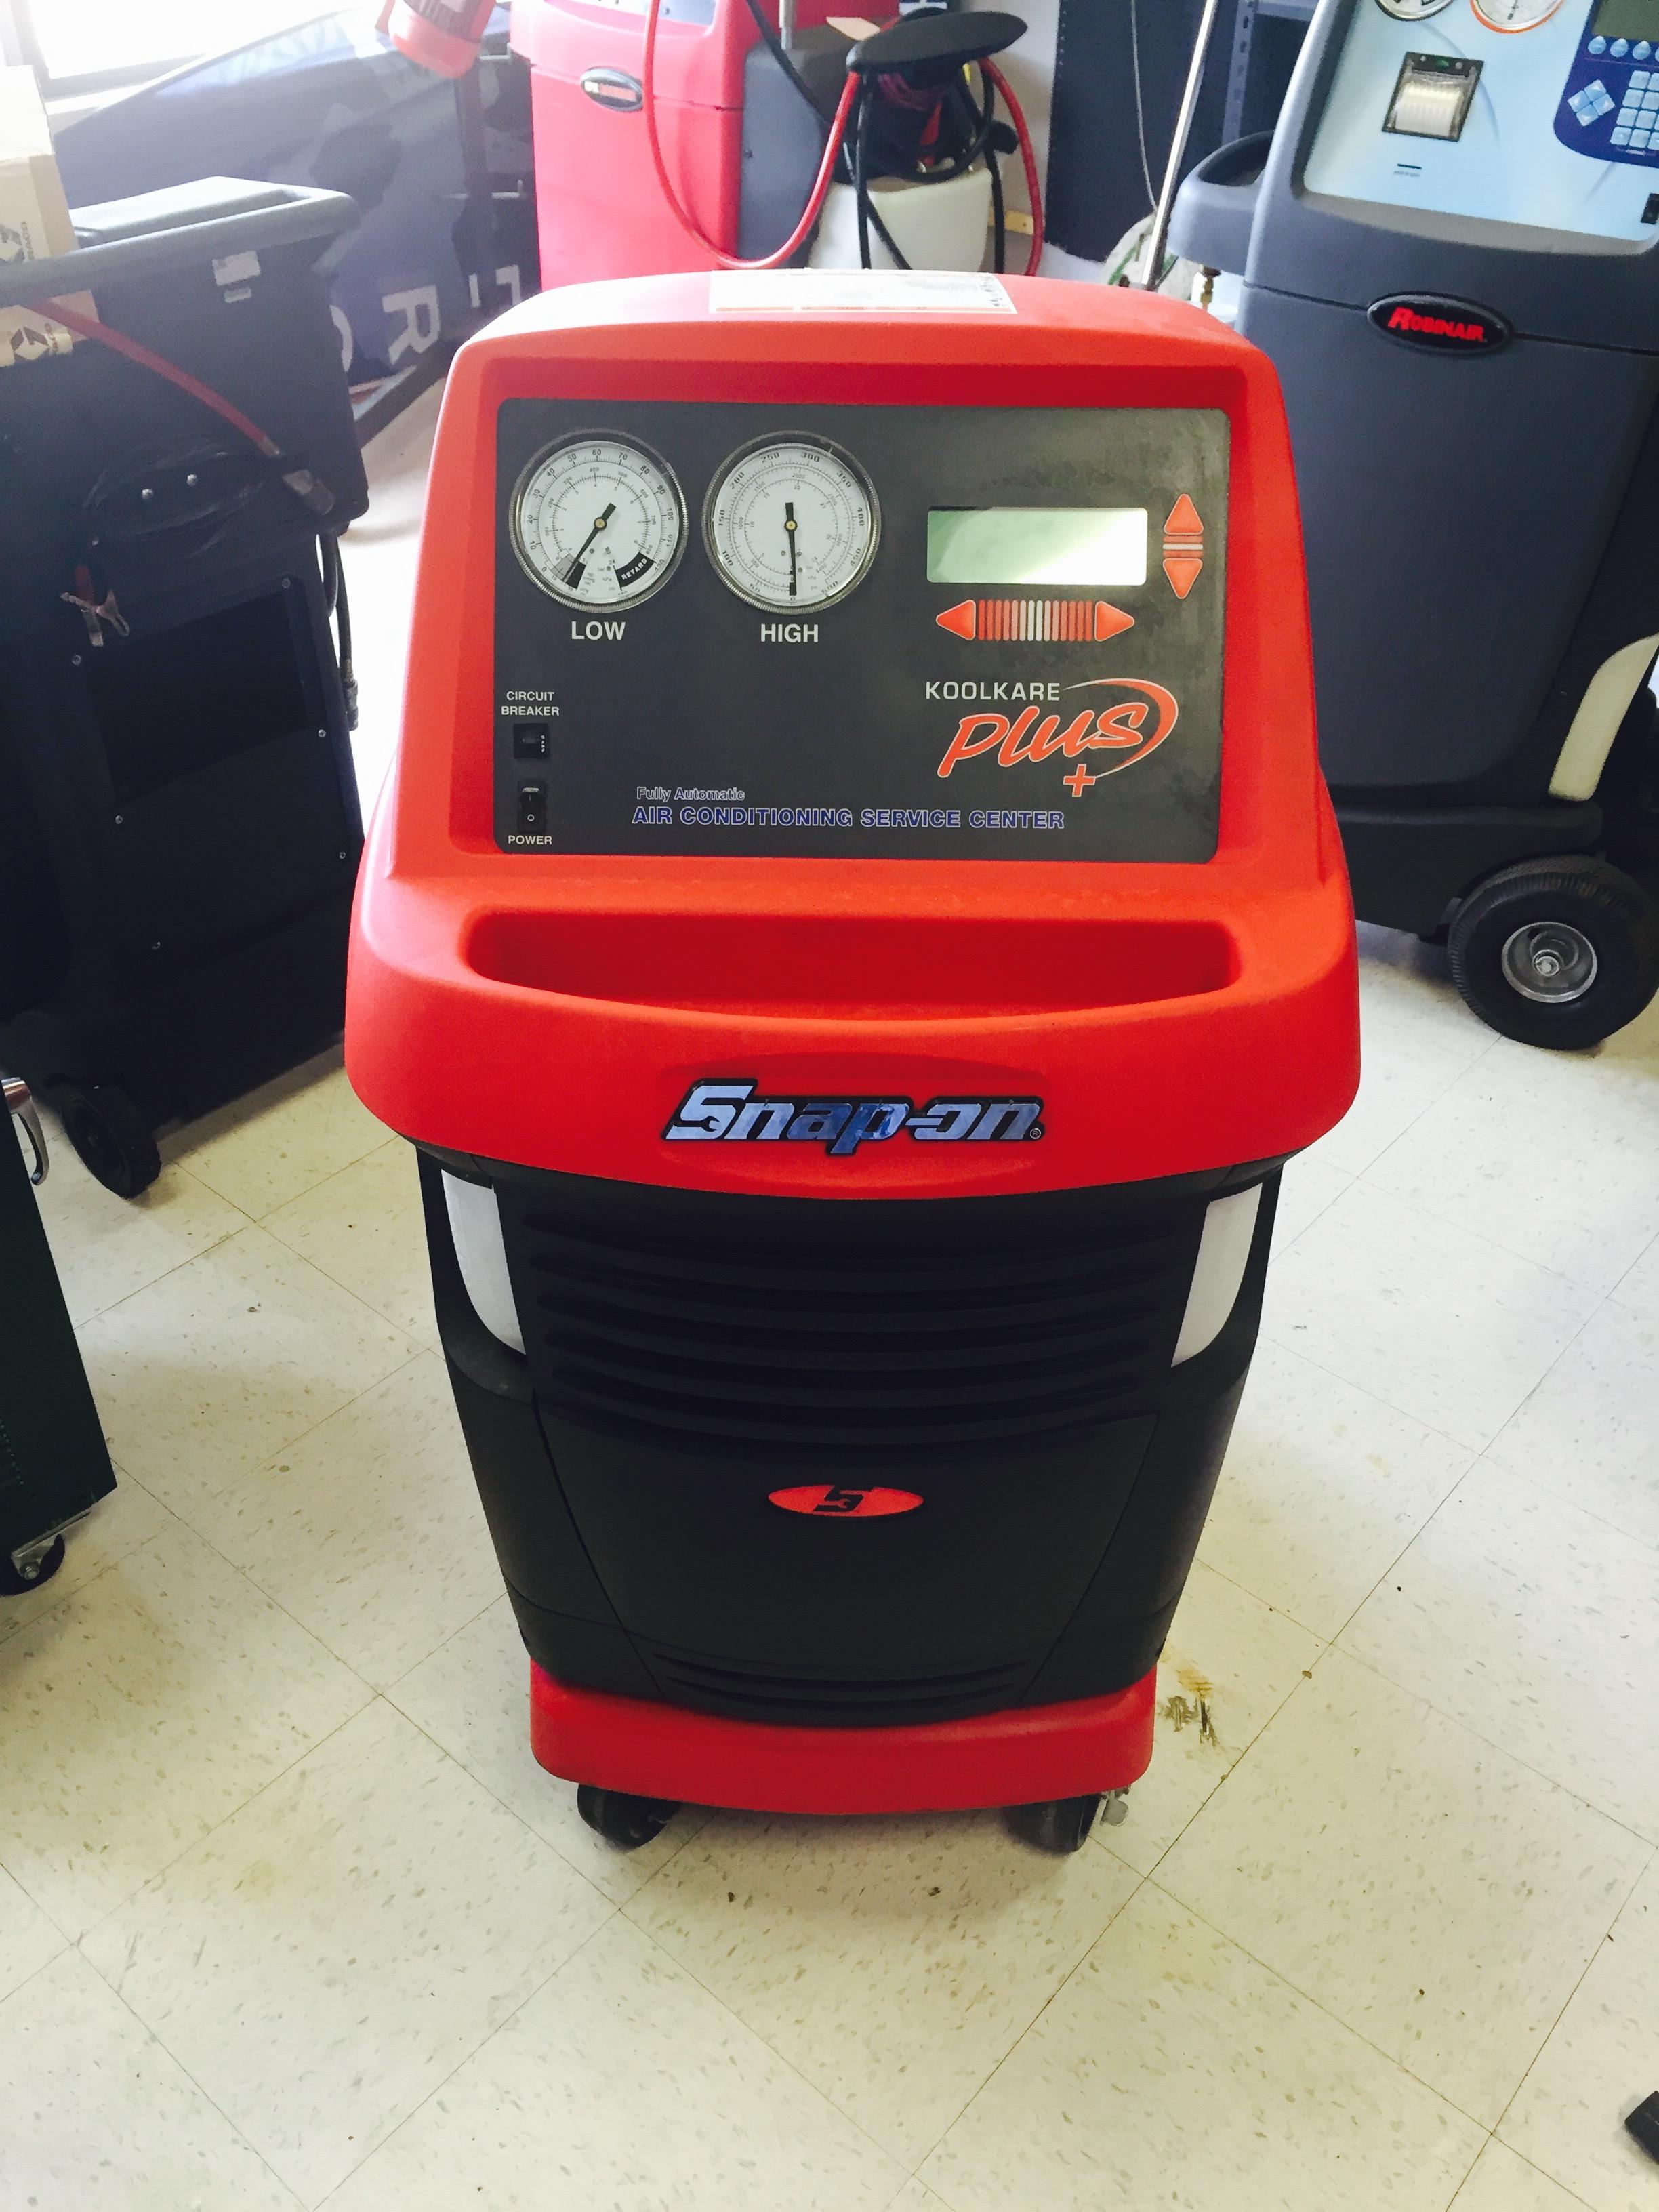 Robinair Ac Machine >> Un-Used/ Factory Return Snap-On EEAC325B AC Machine ...